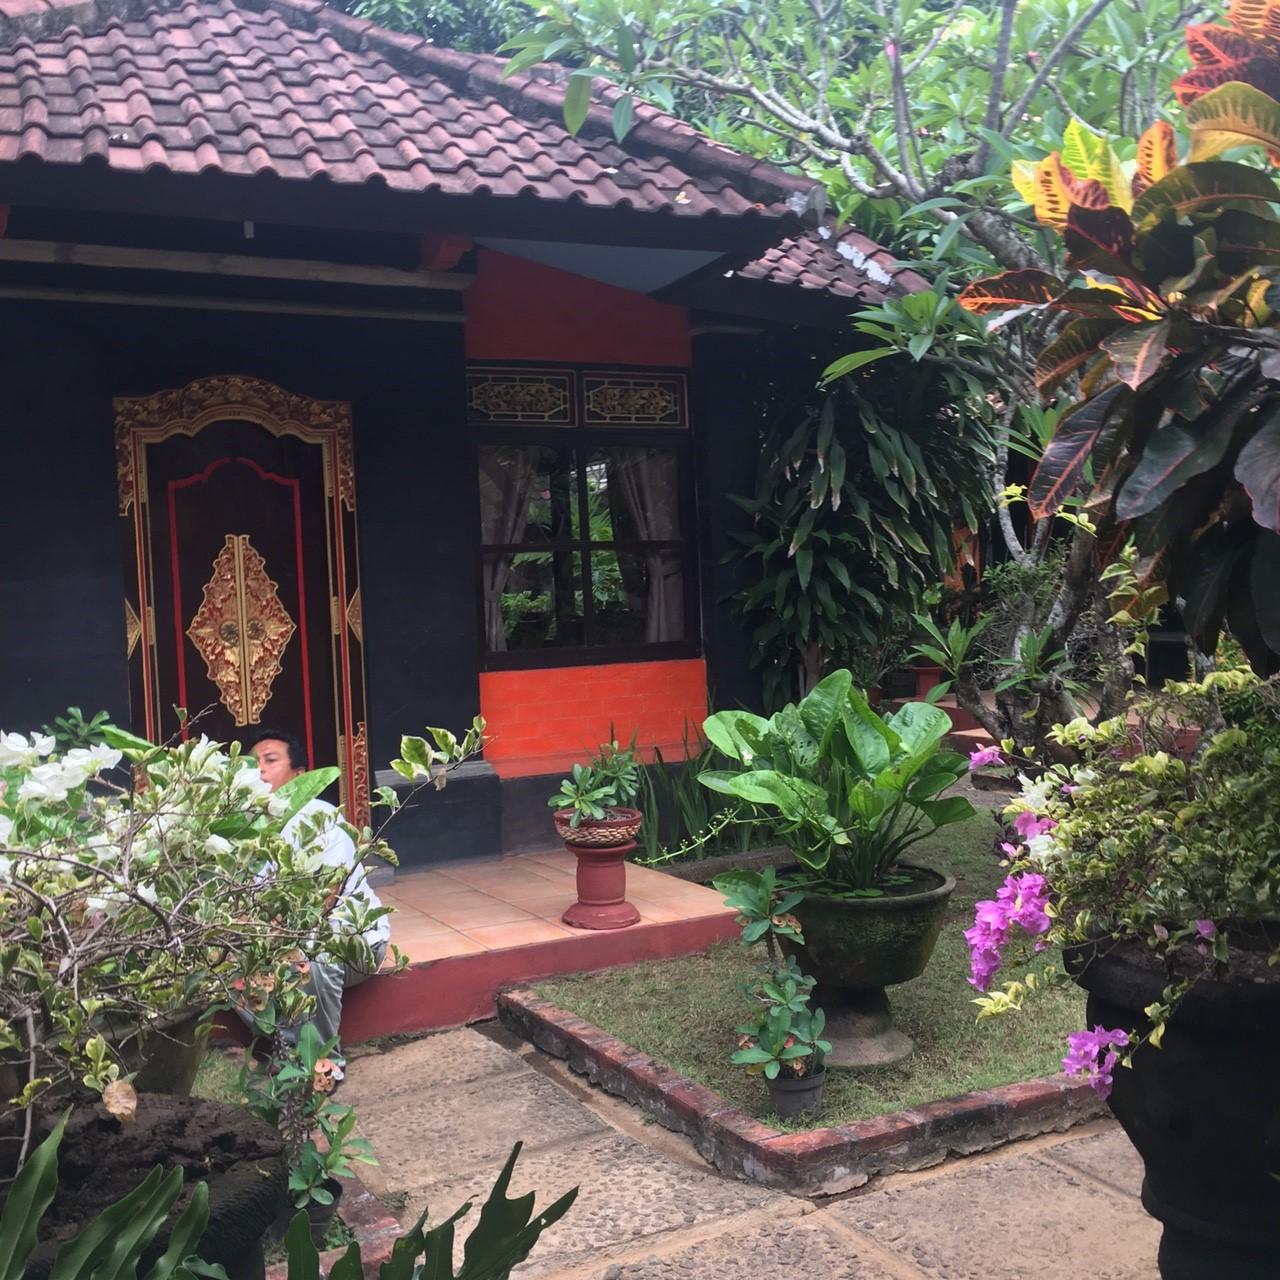 Bali Bali 1112-14_180817_0186